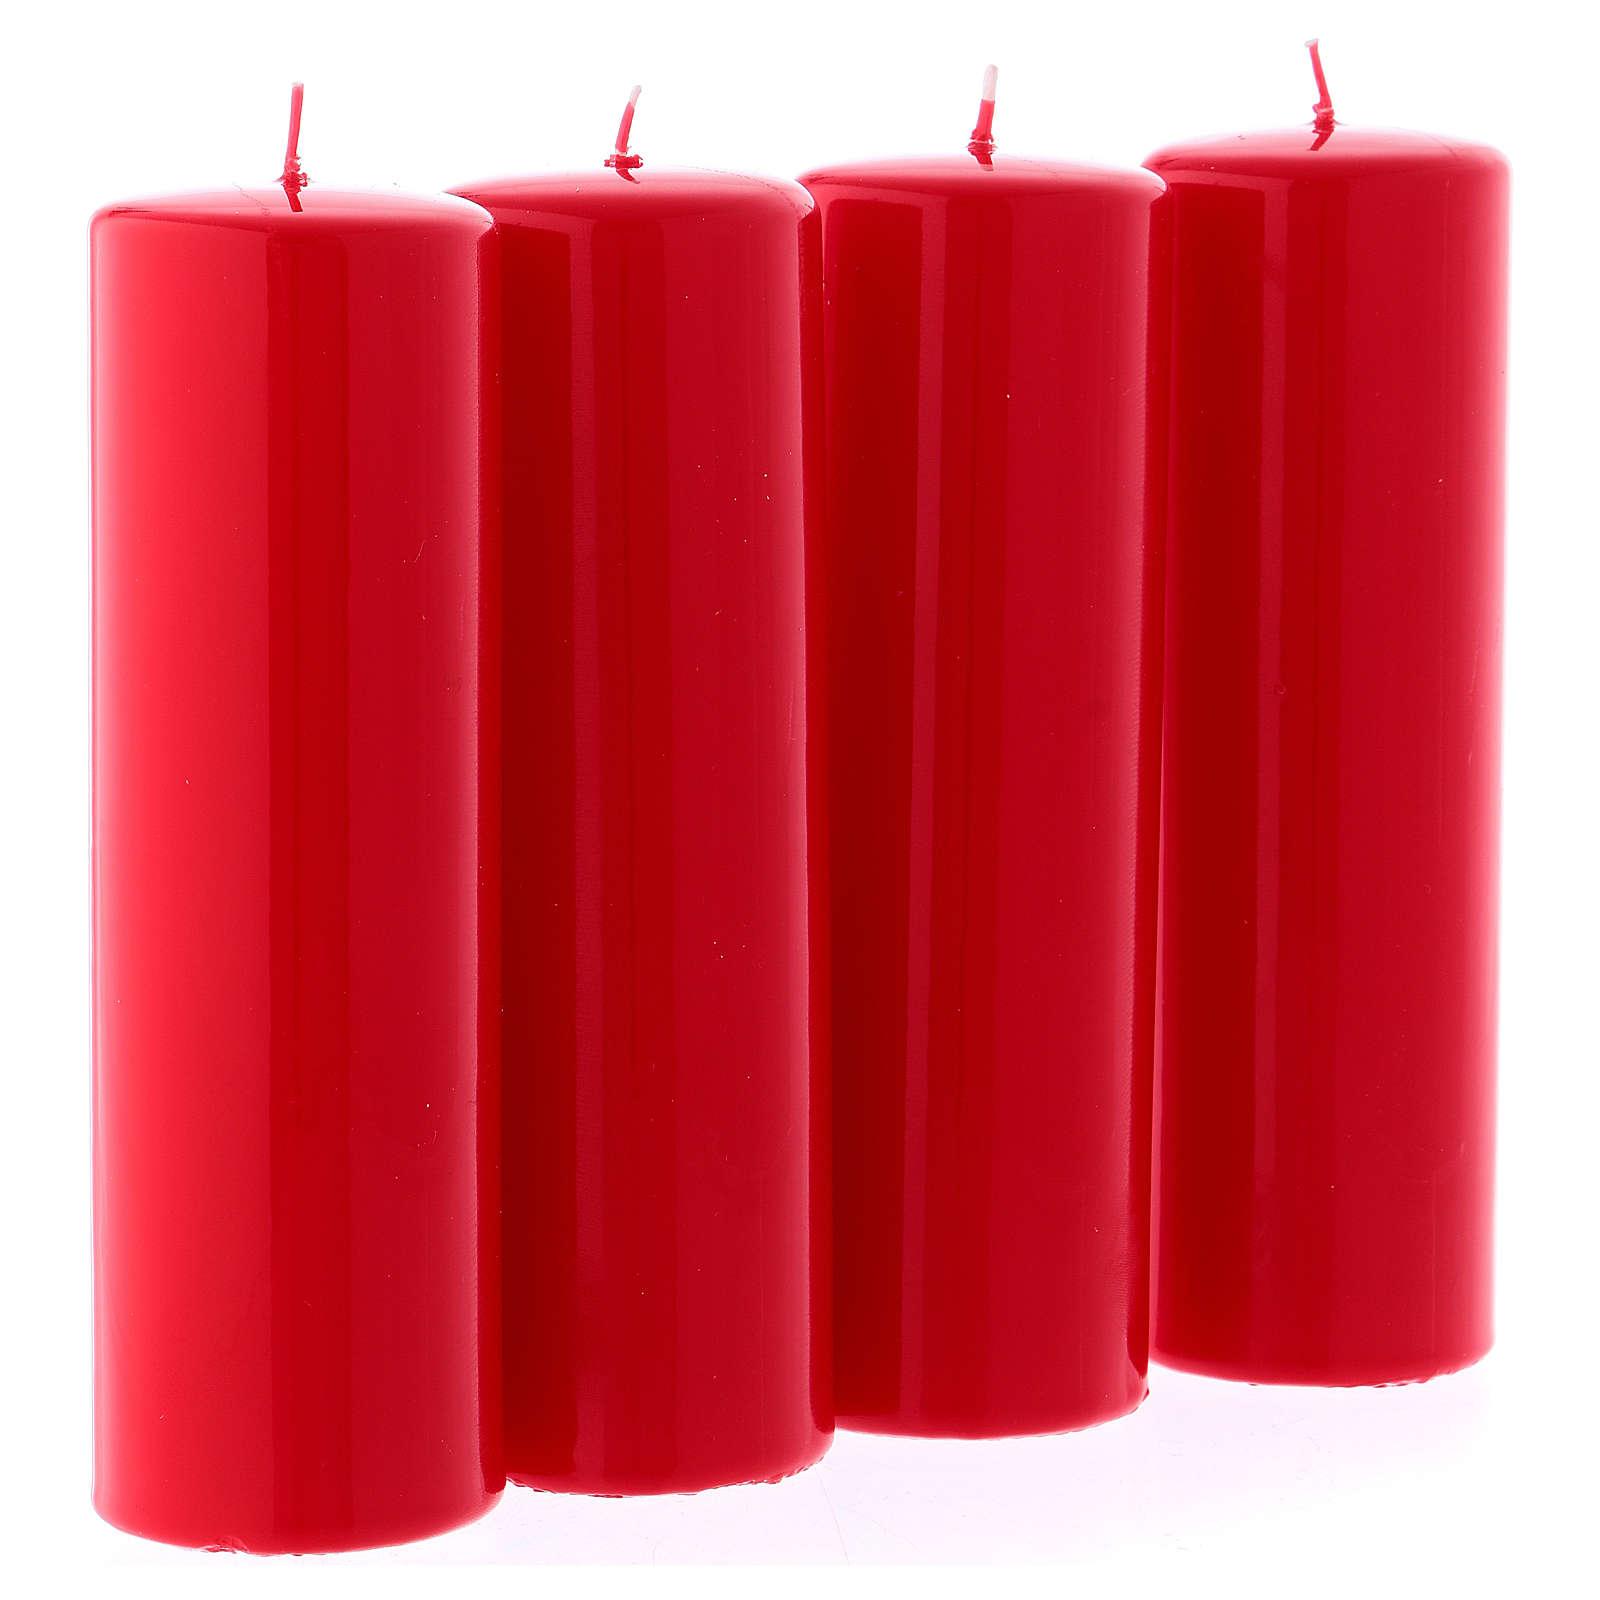 Candele lucide rosse per l' Avvento kit 4 6x20 cm 3